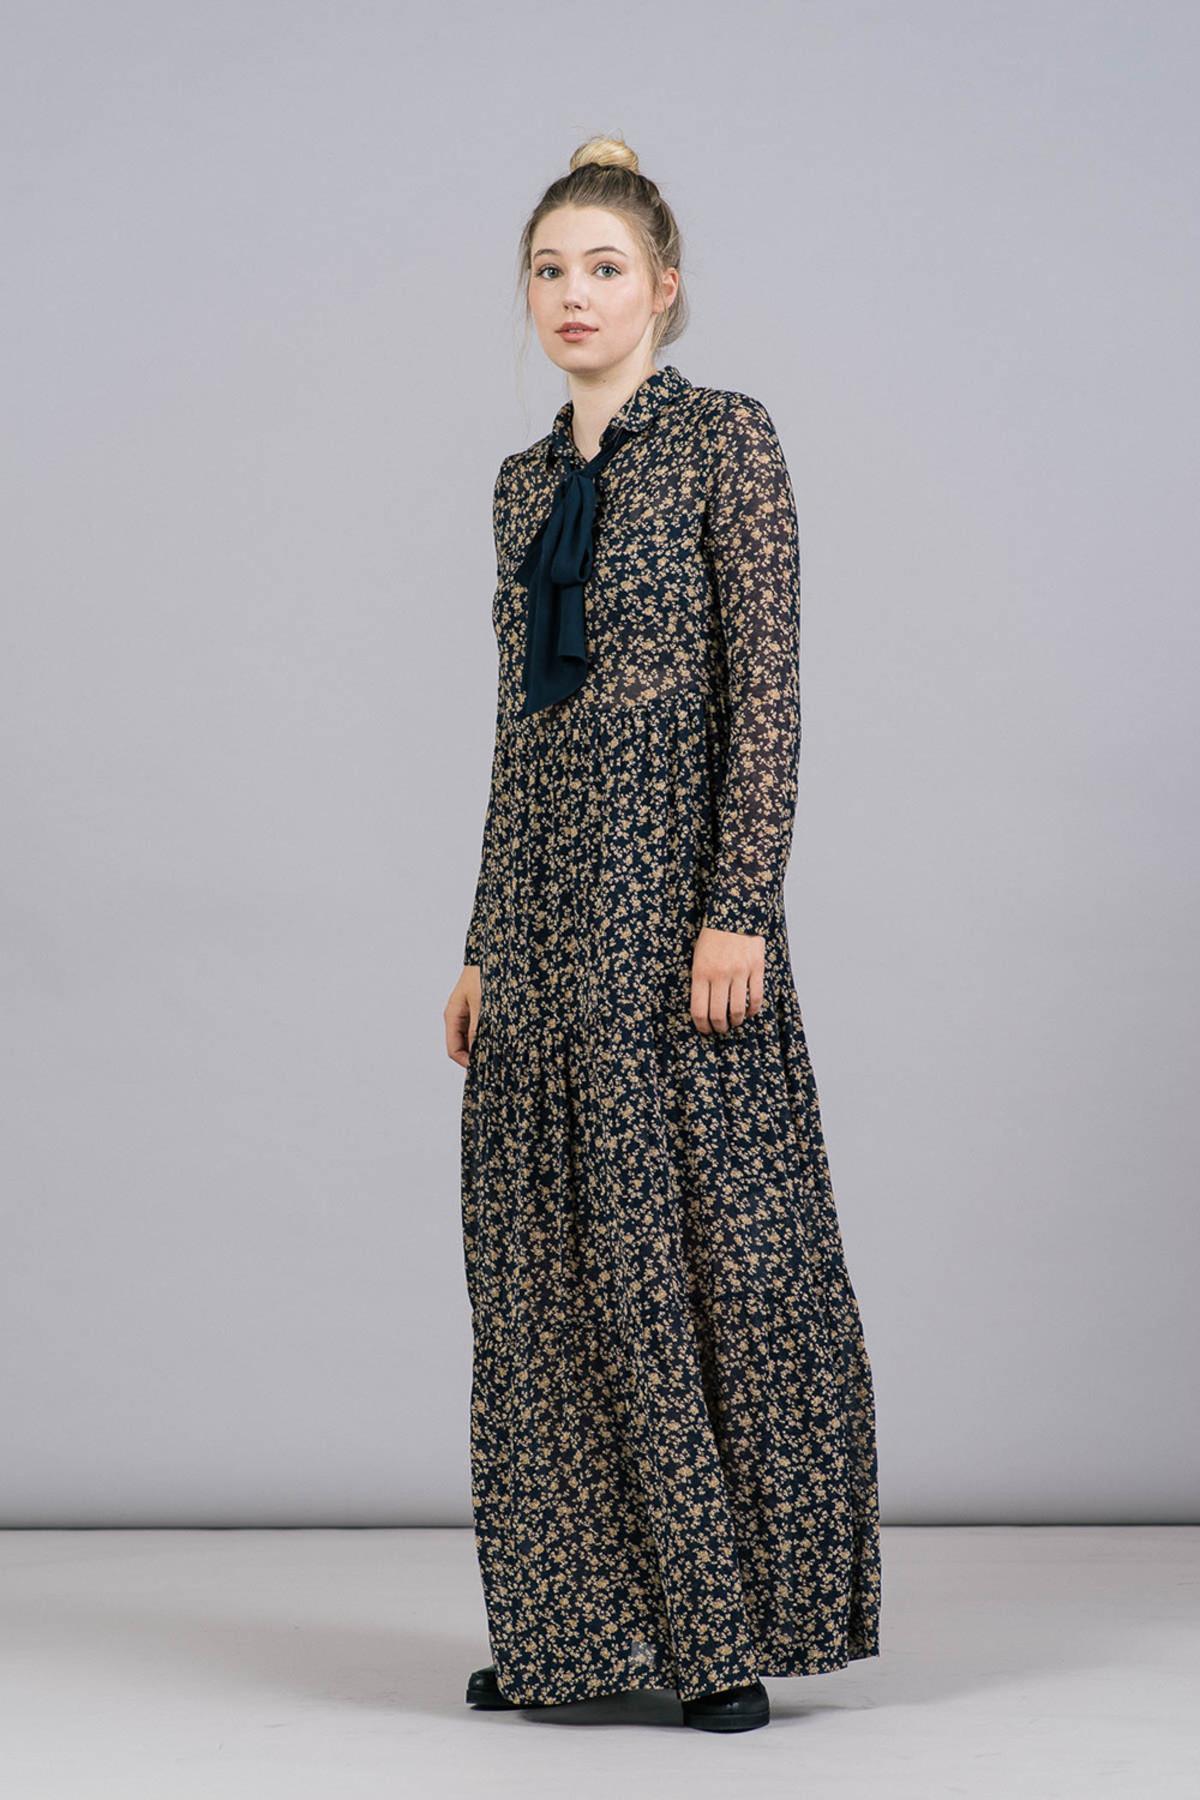 Ganni Bartlett Georgette Maxi Dress from REFINED | Garmentory